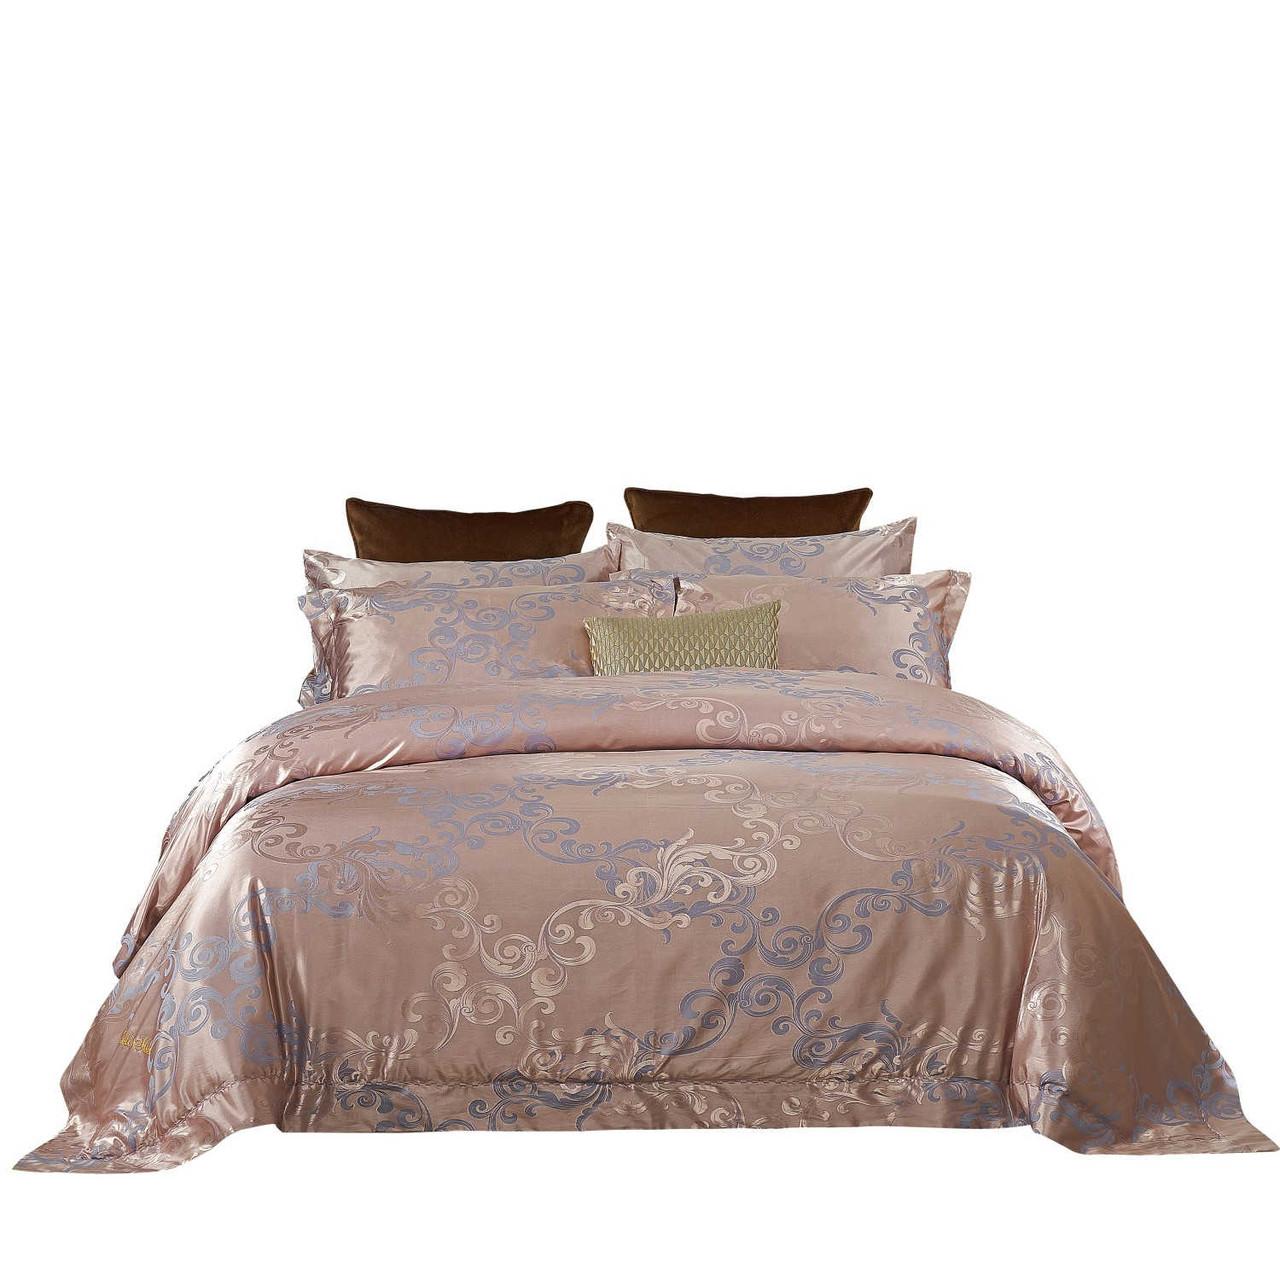 DM801K Dolce-Mela Luxury Bedding Set Wholesale-Dropship